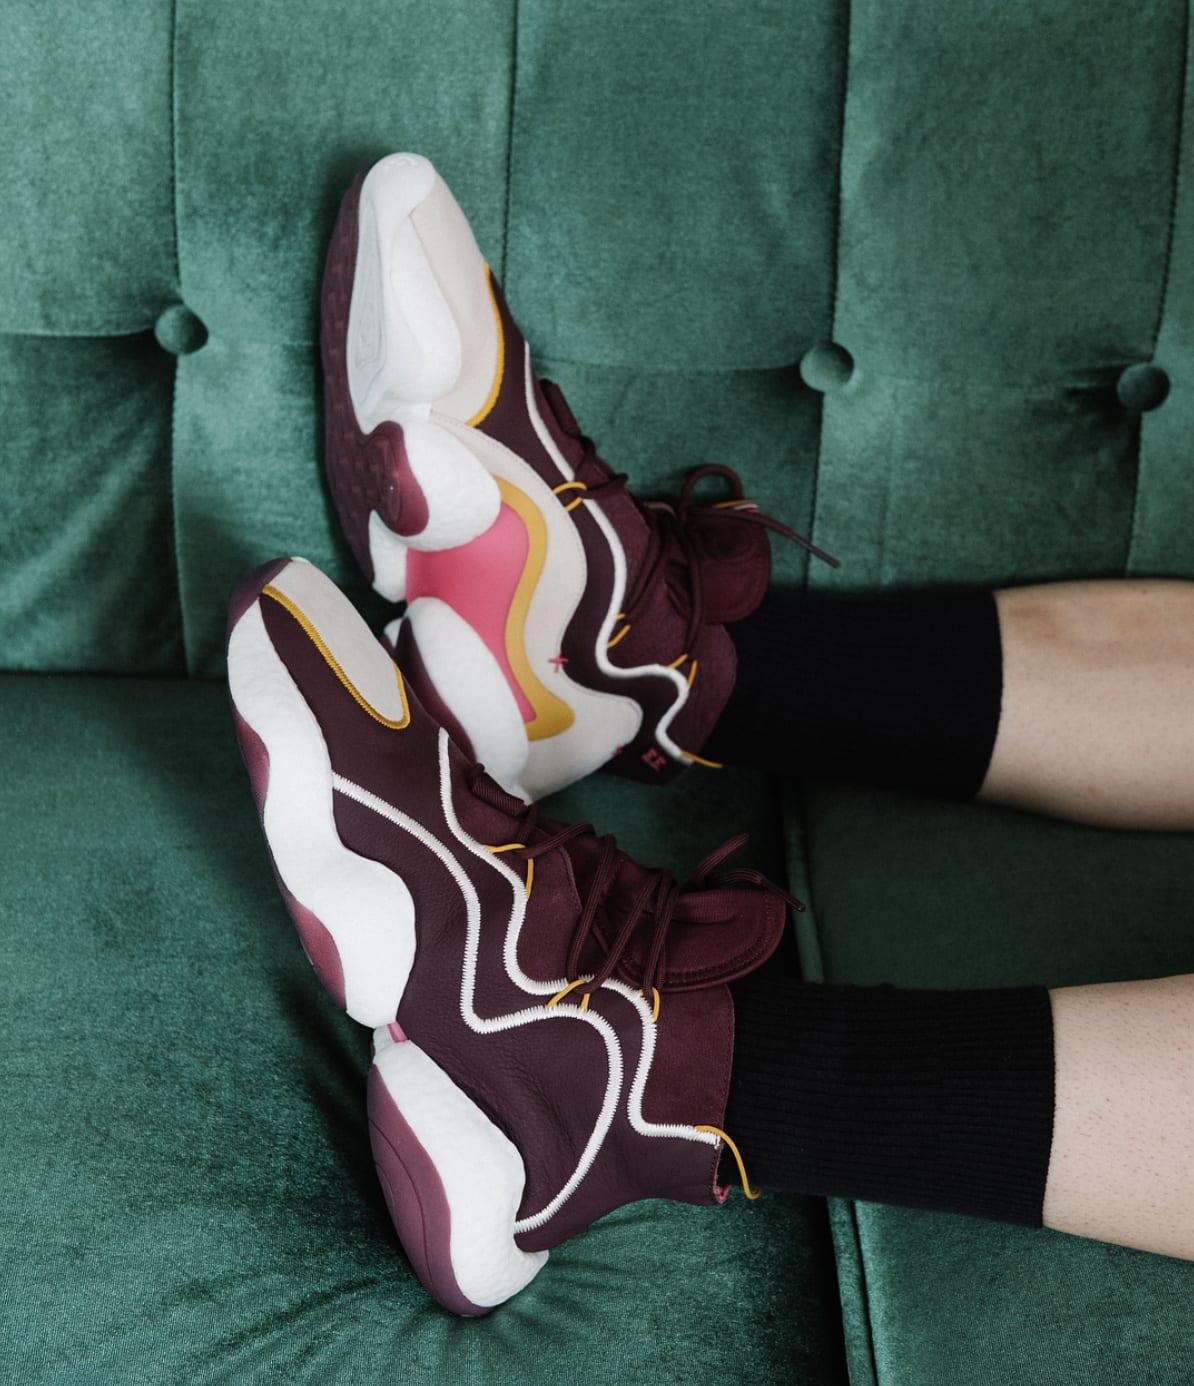 Eric Emanuel x Adidas Crazy BYW Collaboration 1